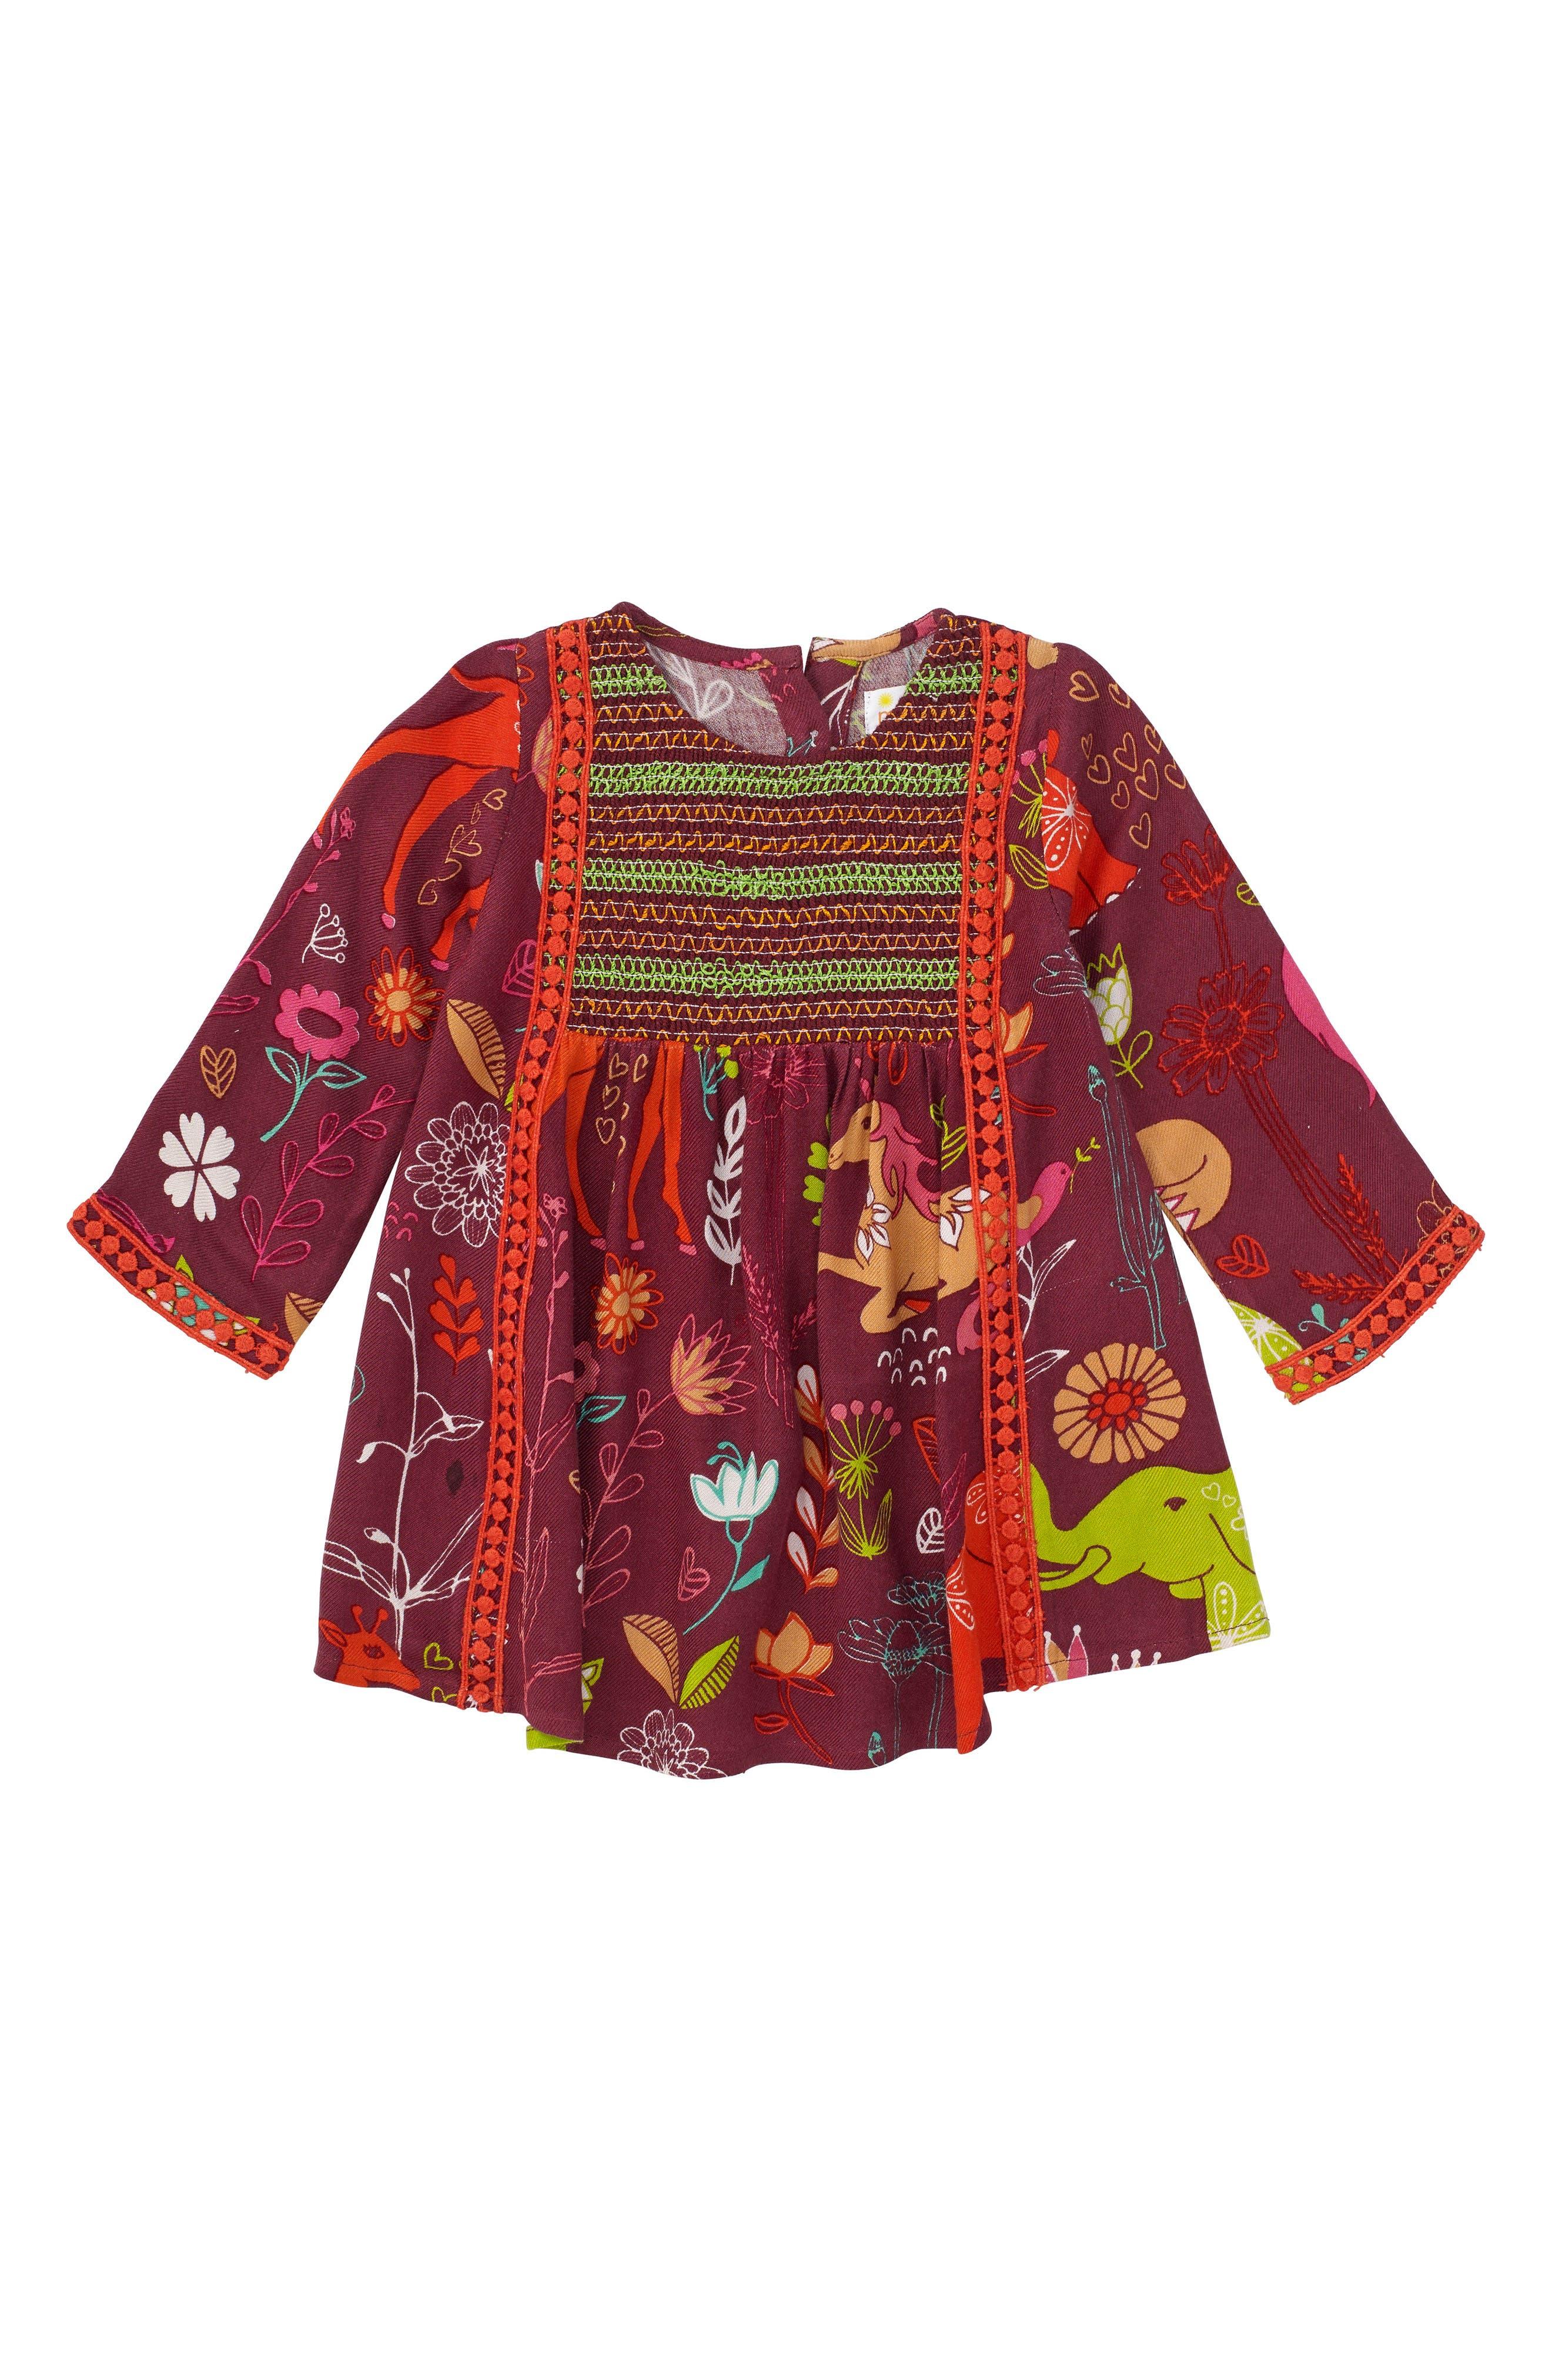 Alternate Image 1 Selected - Masasla Baby Magical Smocked Dress (Baby Girls)